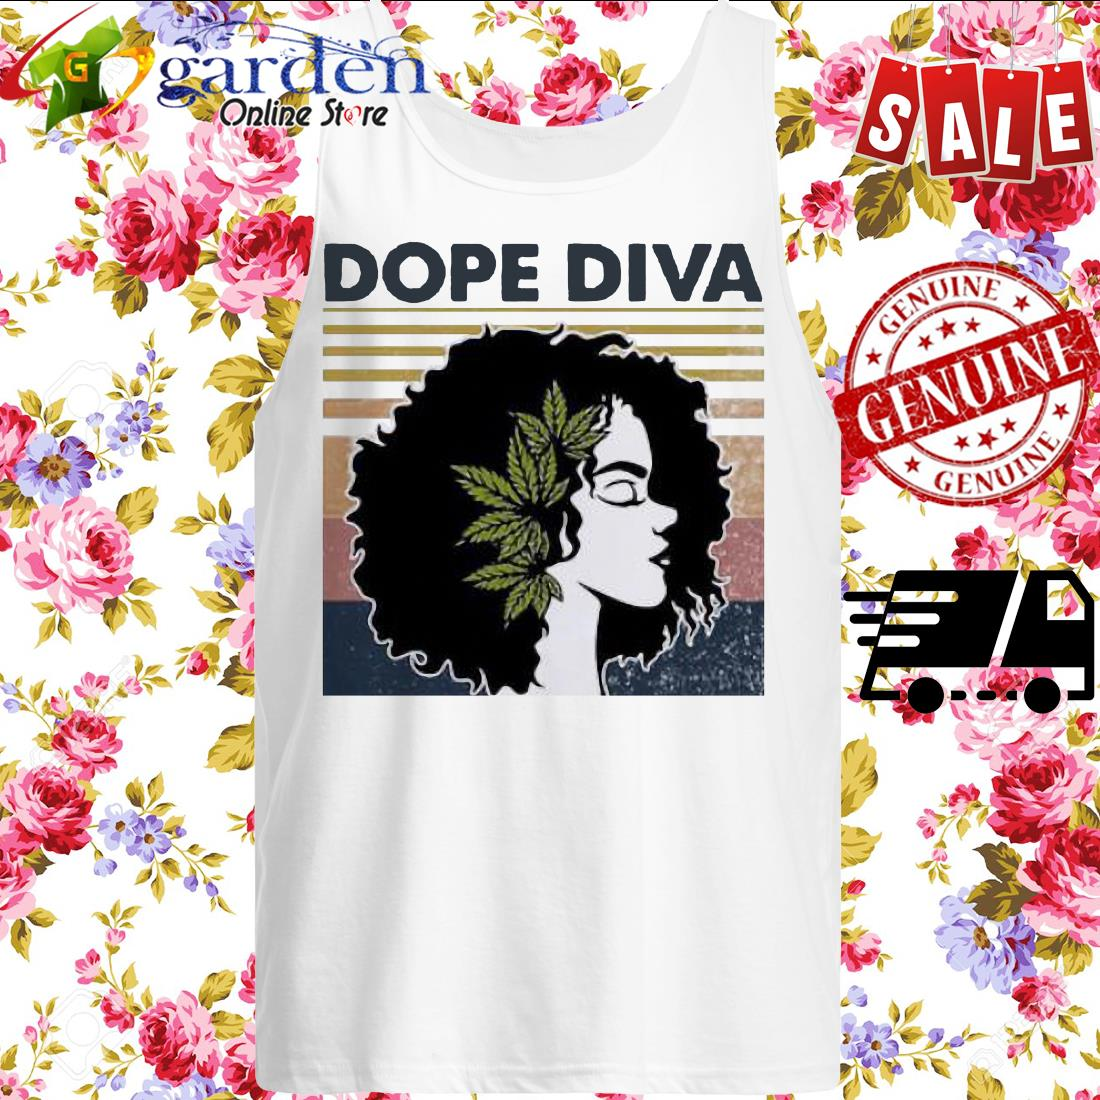 Dope Diva Black Girl Vintage tank top